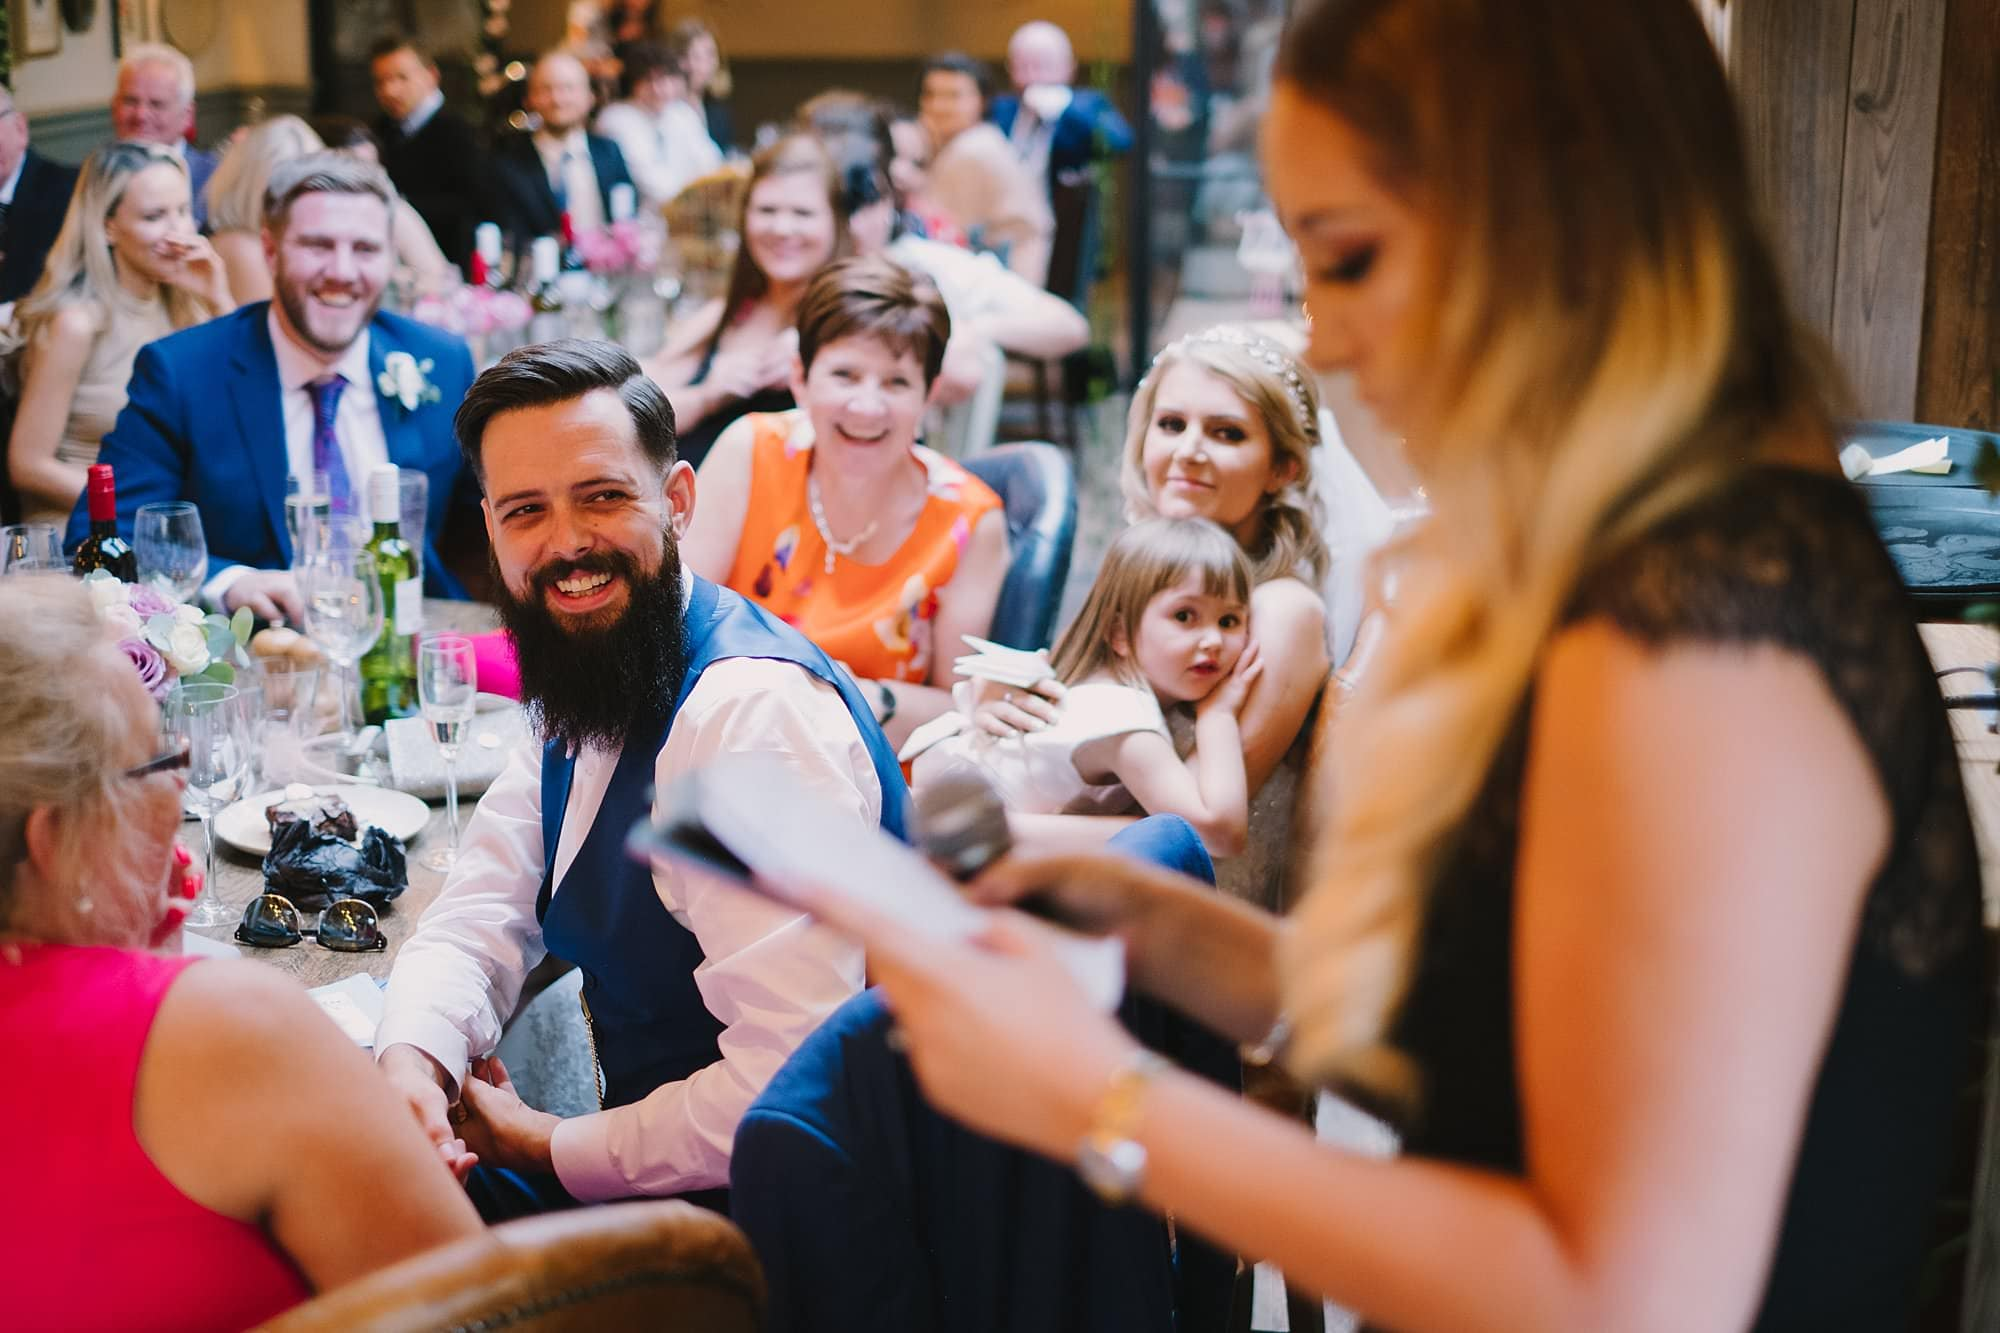 london pub wedding photographer jn 051 - The County Arms Wedding Photographer   Jen & Nick